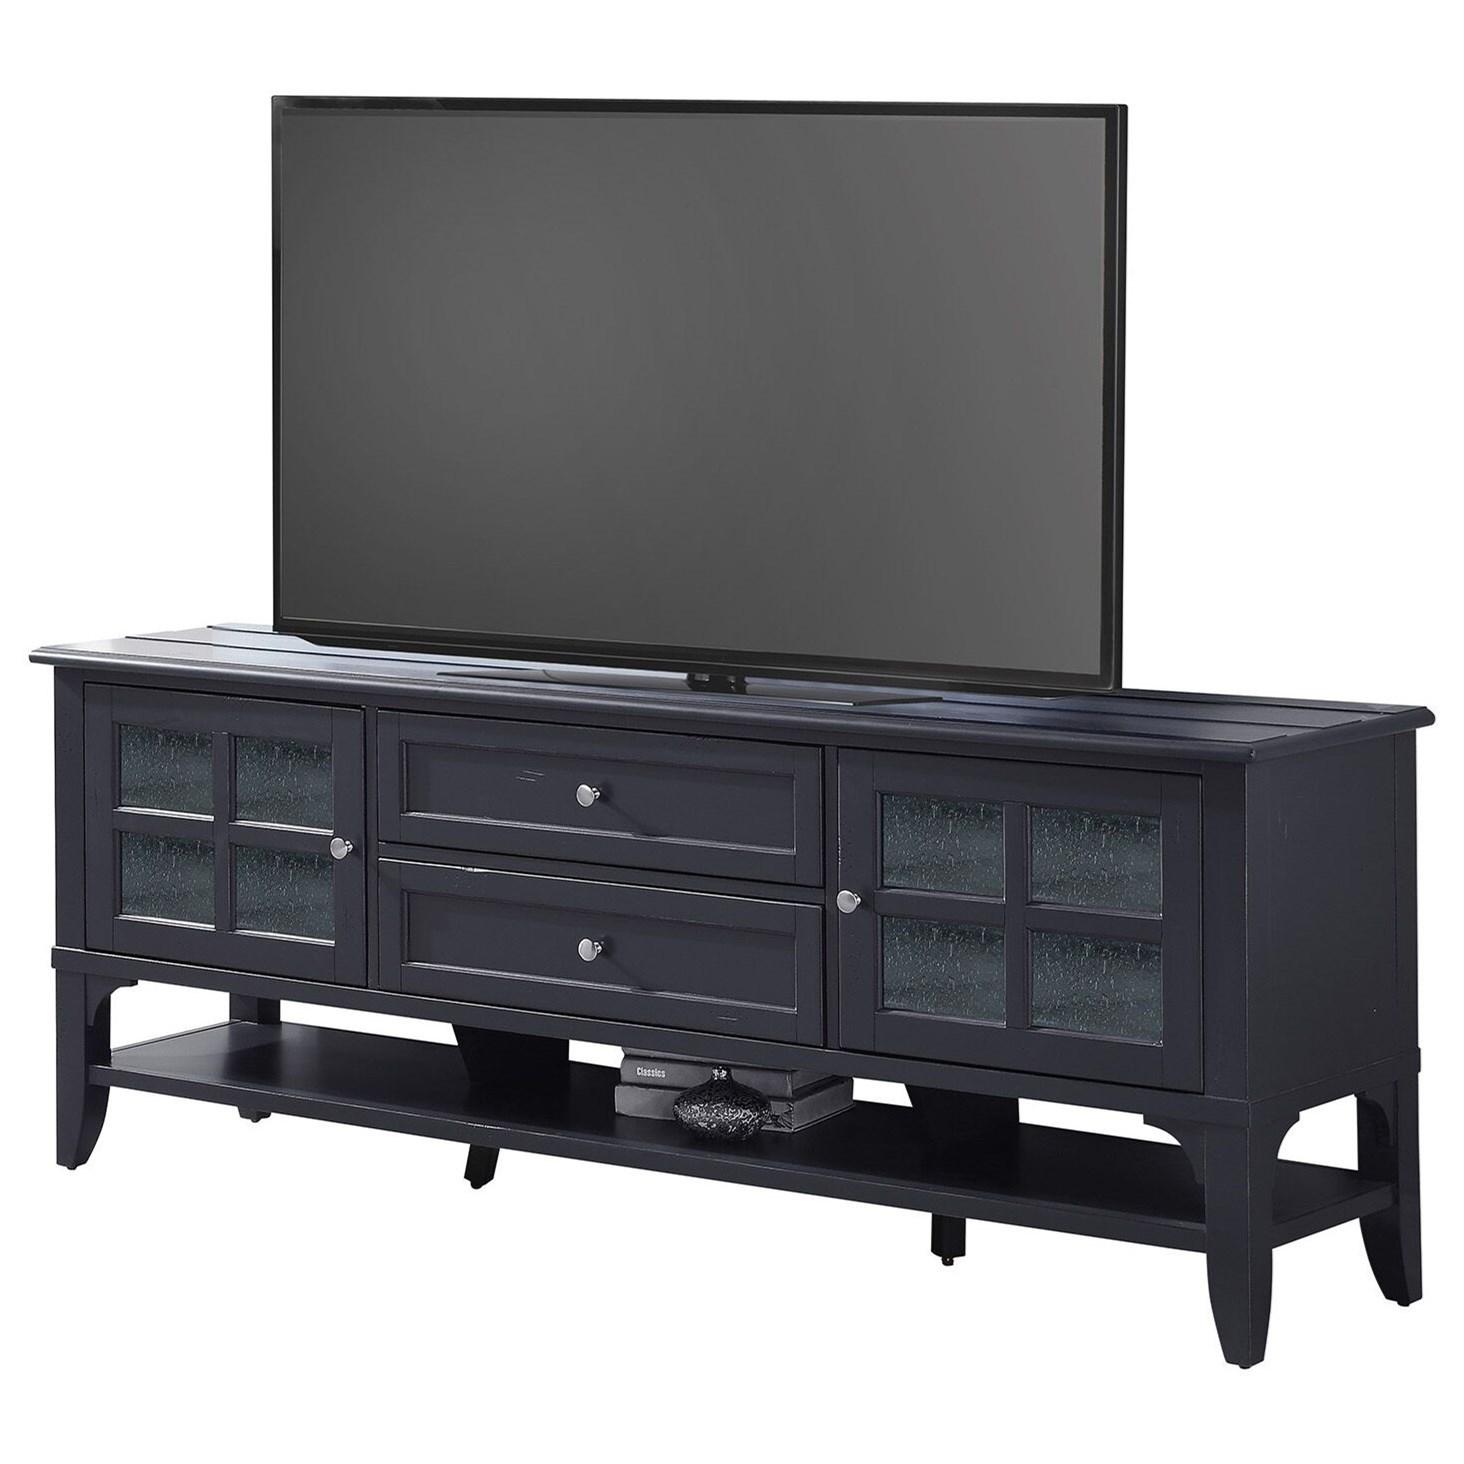 "Lenox Lenox 76"" TV Console by Parker House at Morris Home"